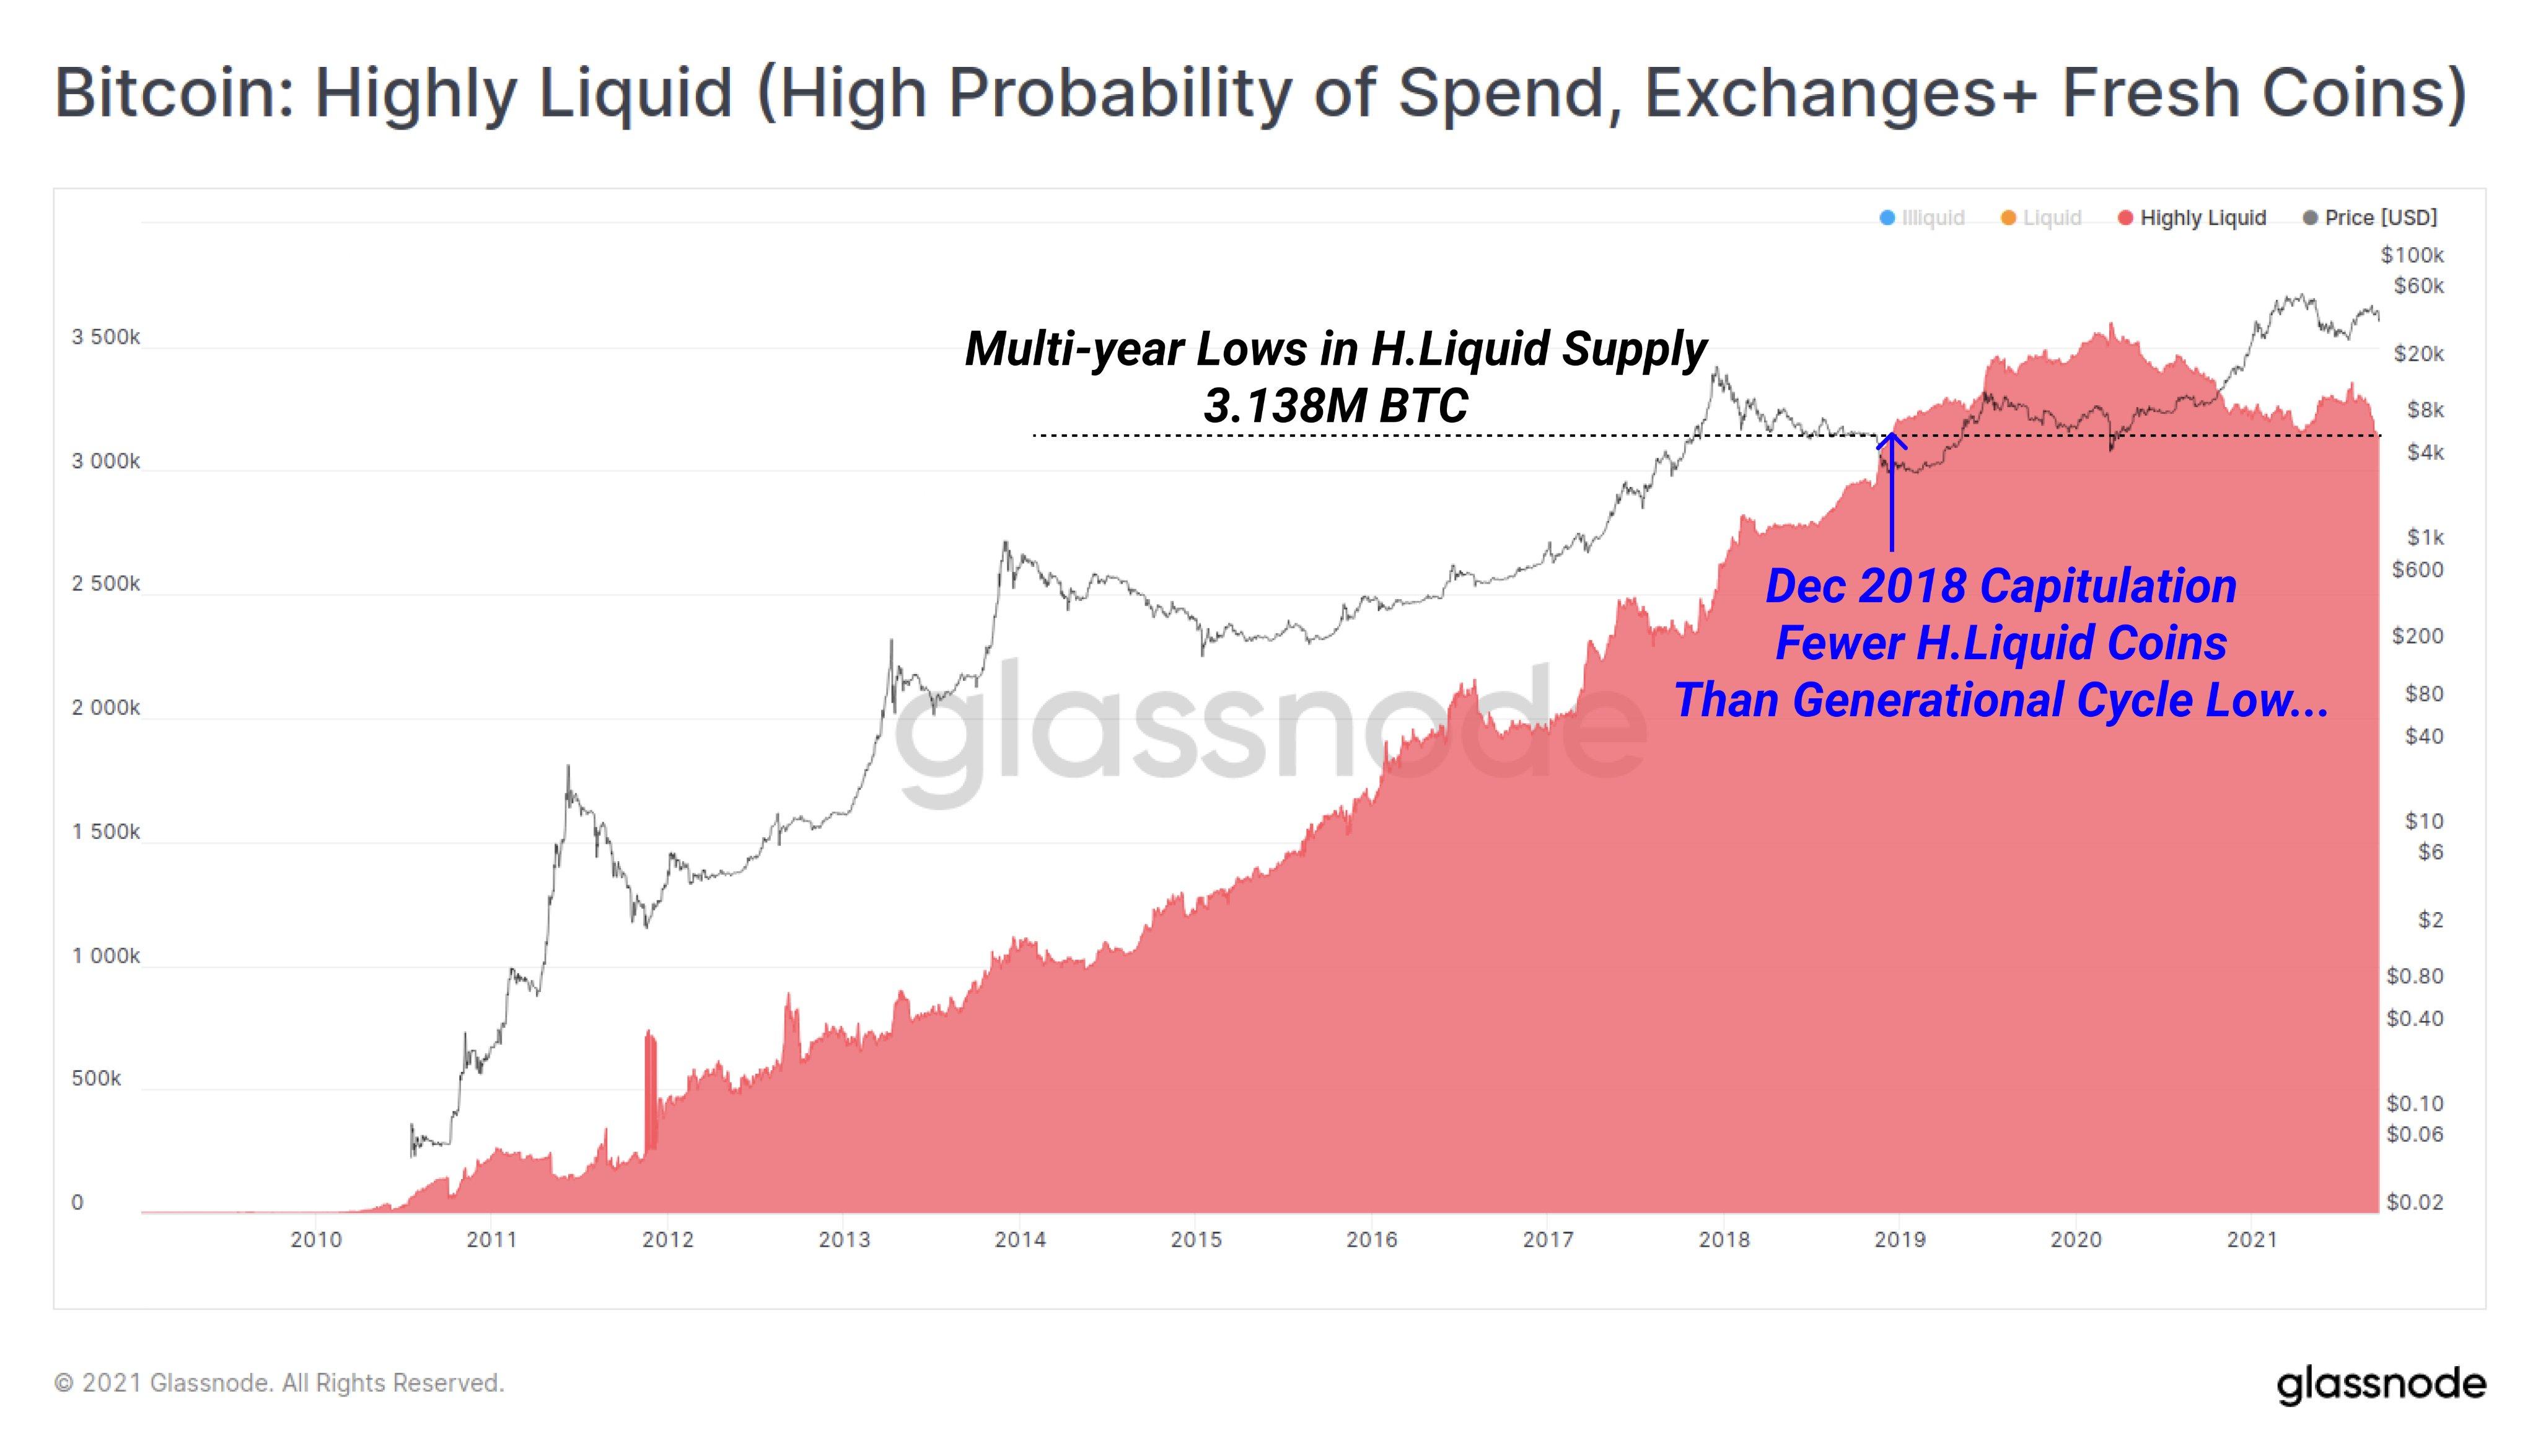 Bitcoin's highly liquid supply